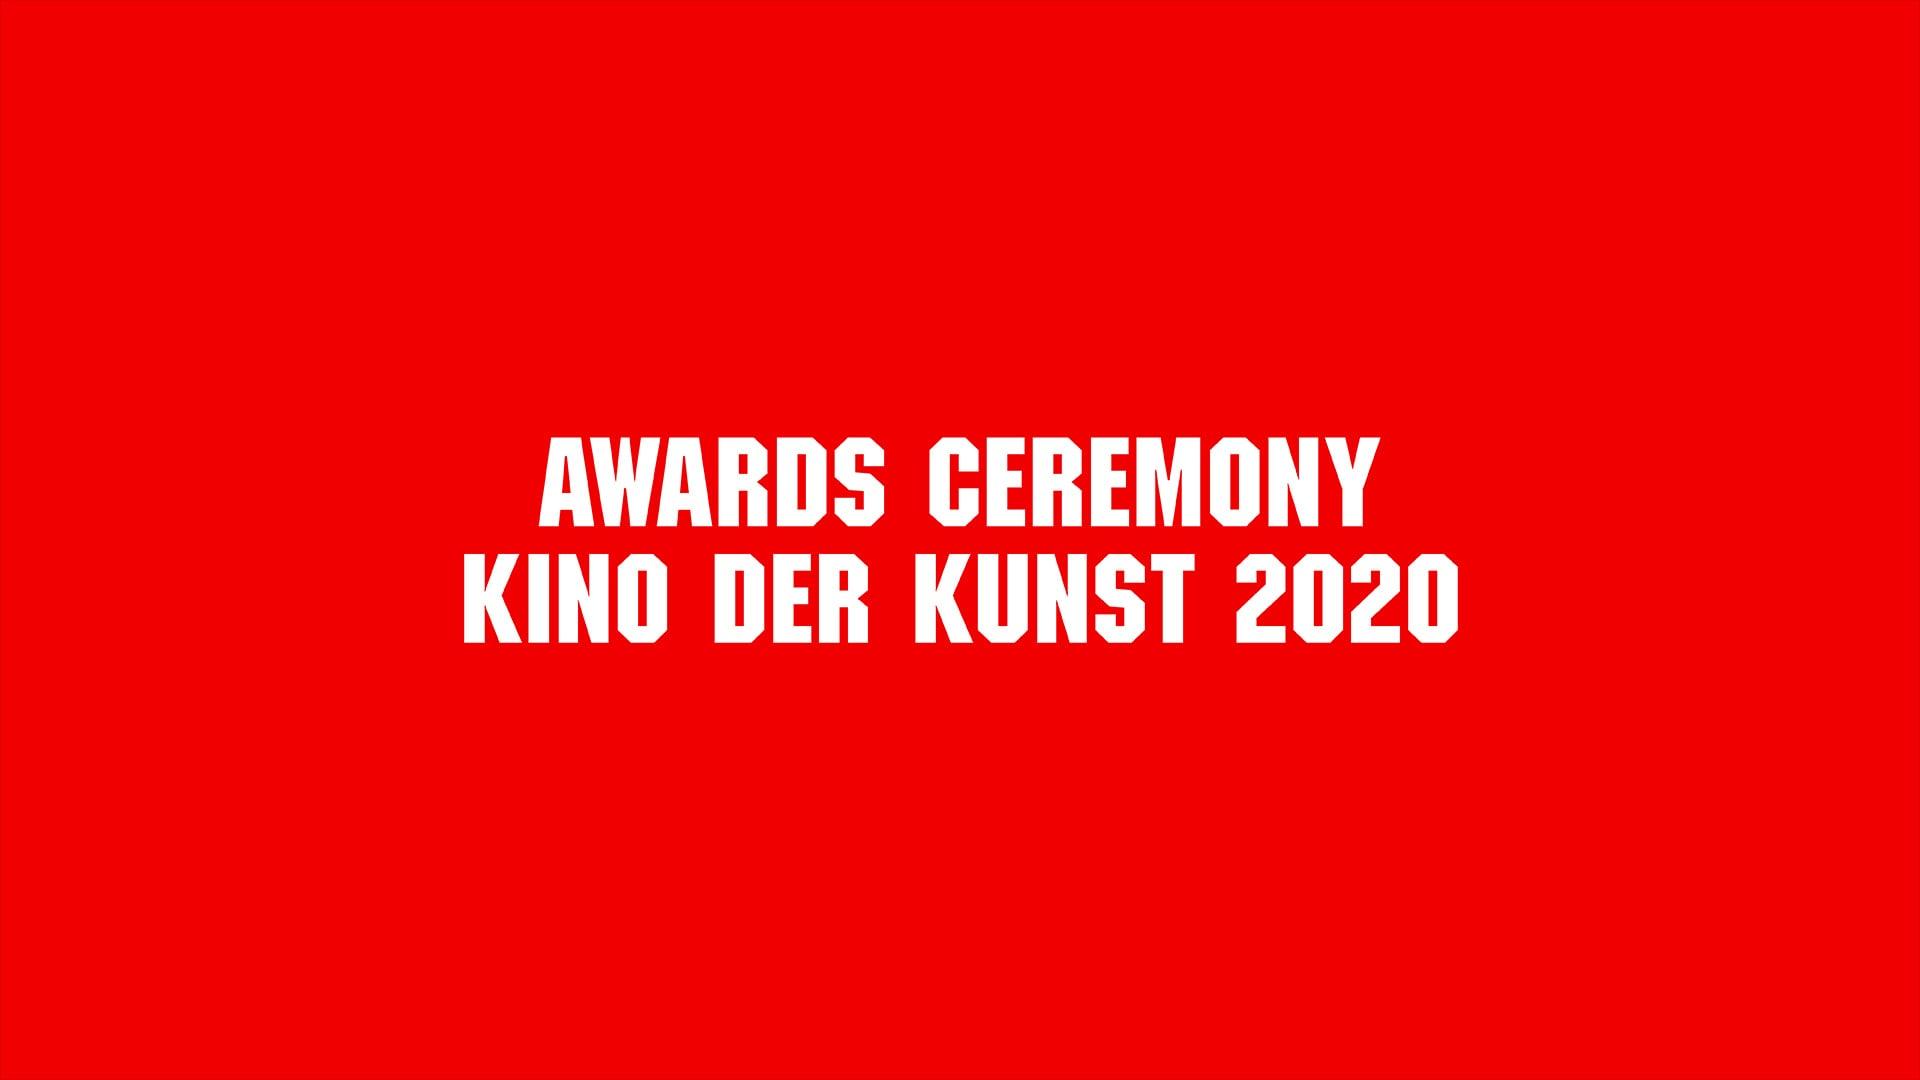 Awards Ceremony Kino der Kunst